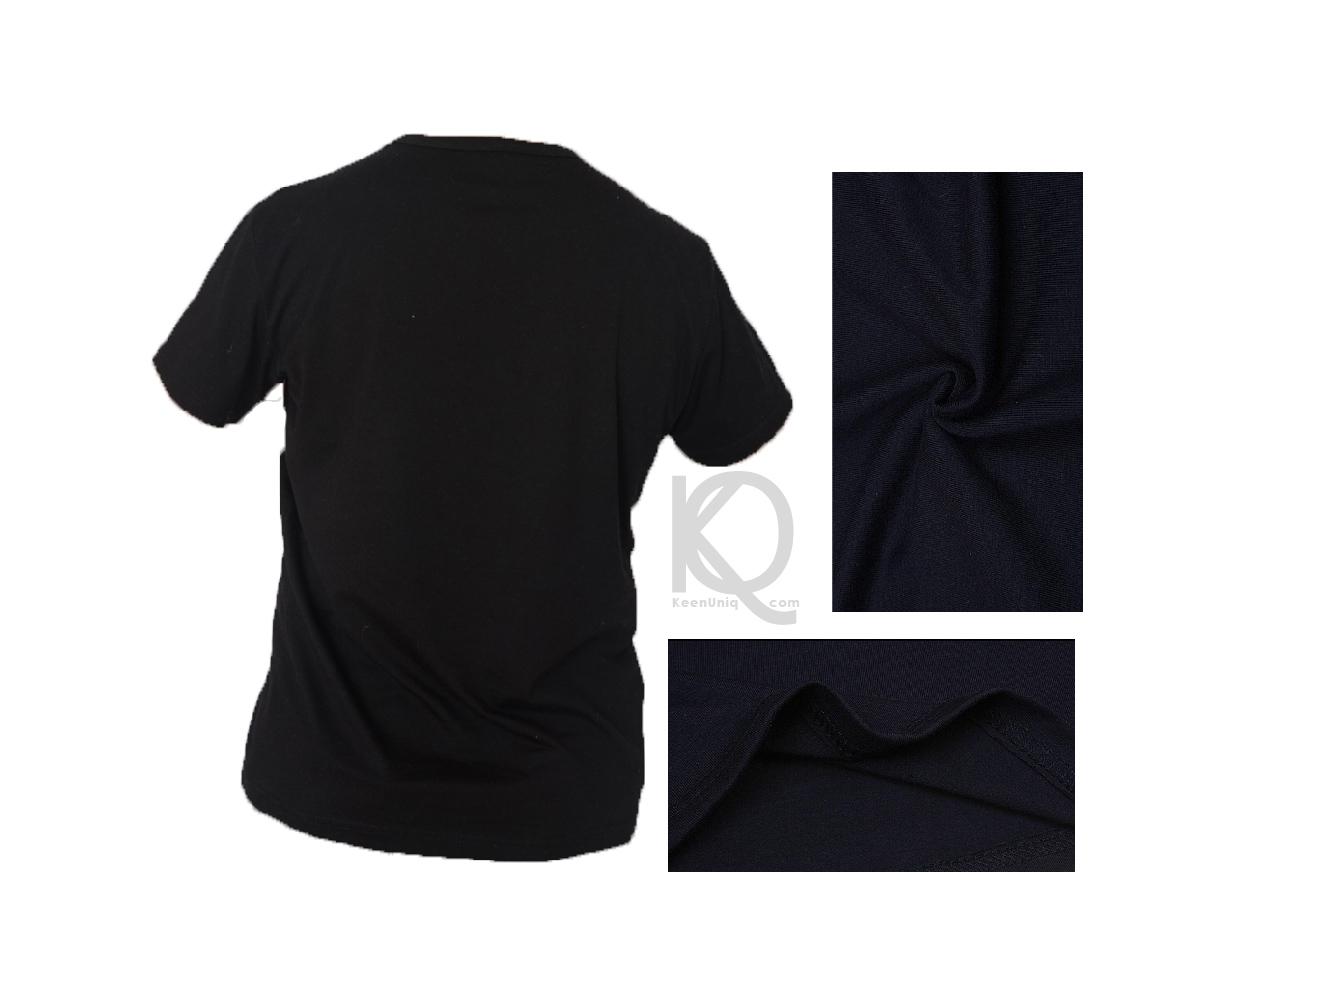 05e84b0f bamboo blank black t-shirt keenuniq; bamboo t-shirt back detail ...